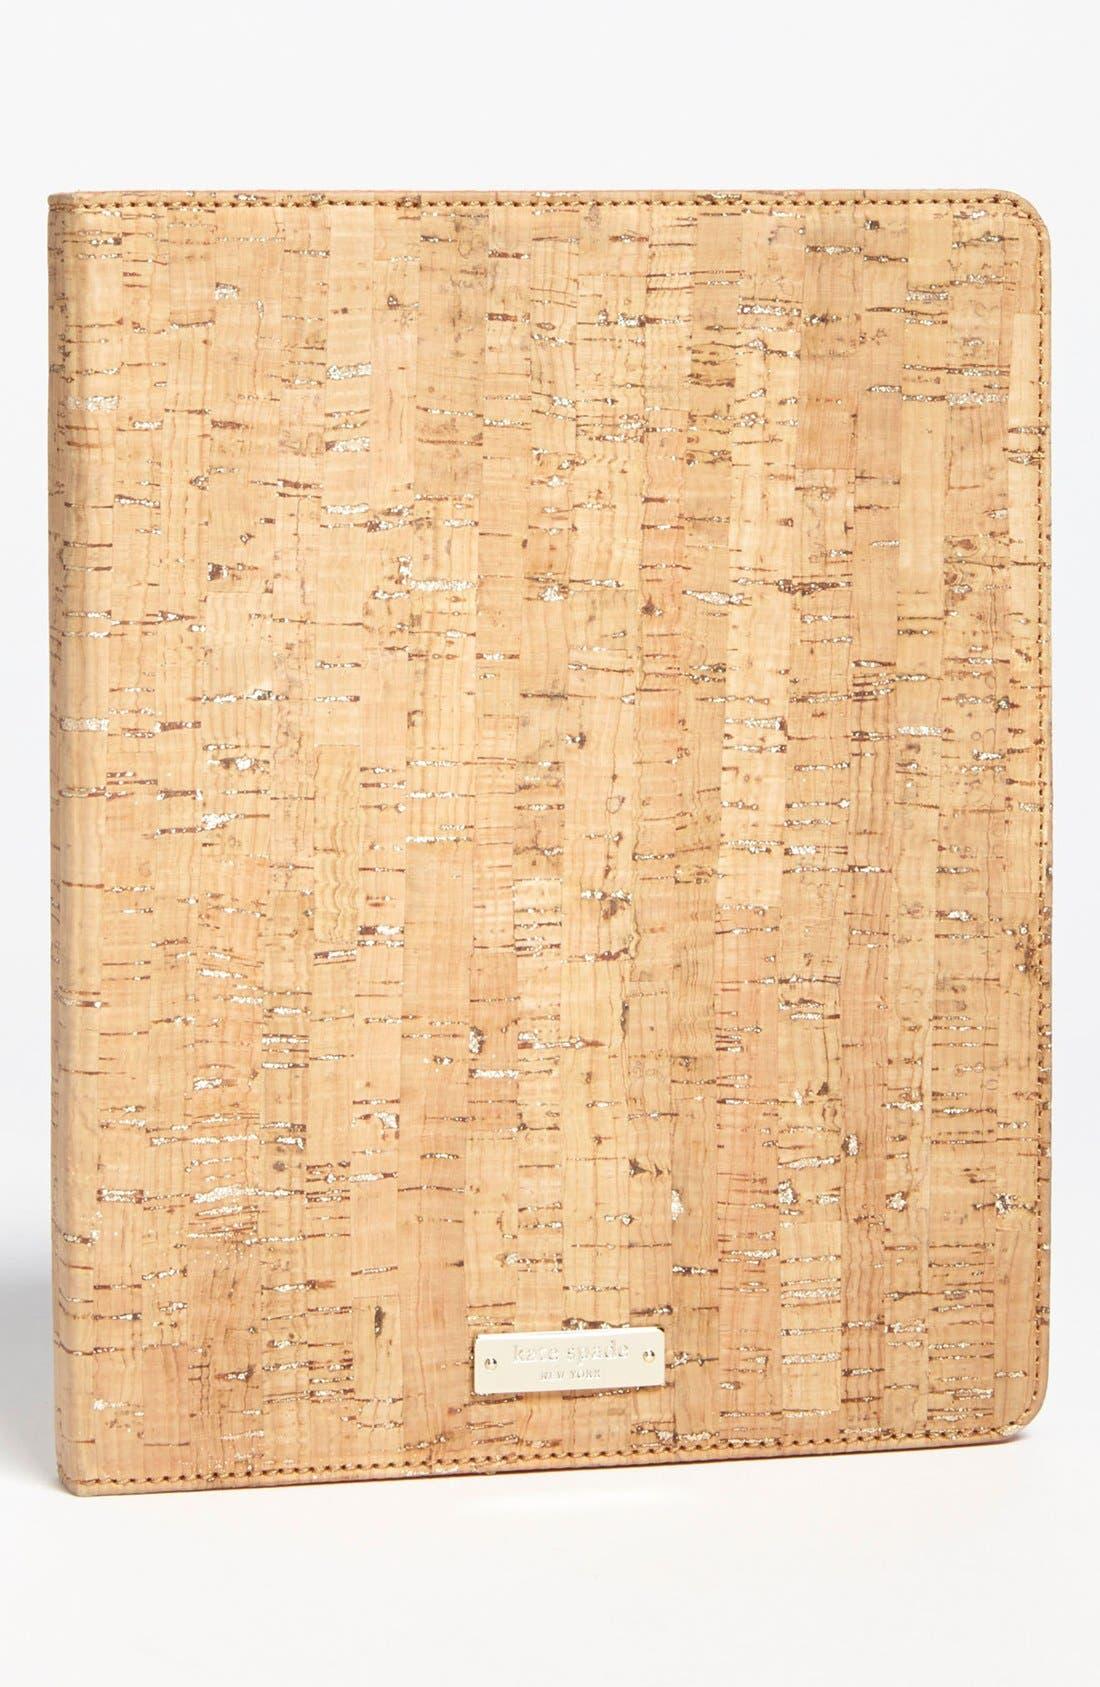 Main Image - kate spade new york 'summer cork' iPad 2 & 3 folio